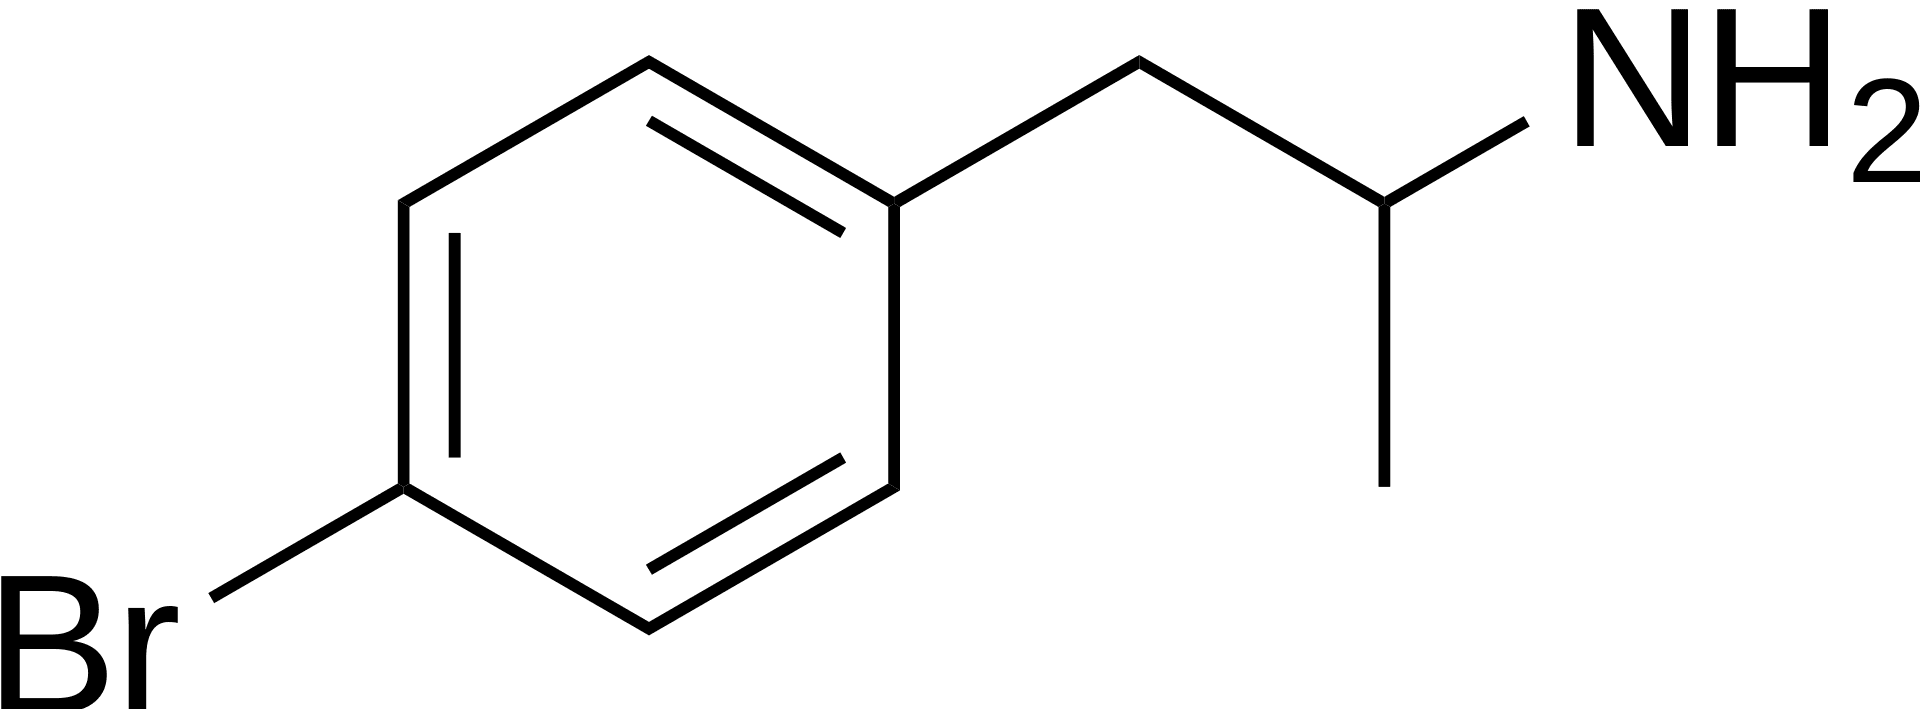 4-bromoamphetamin